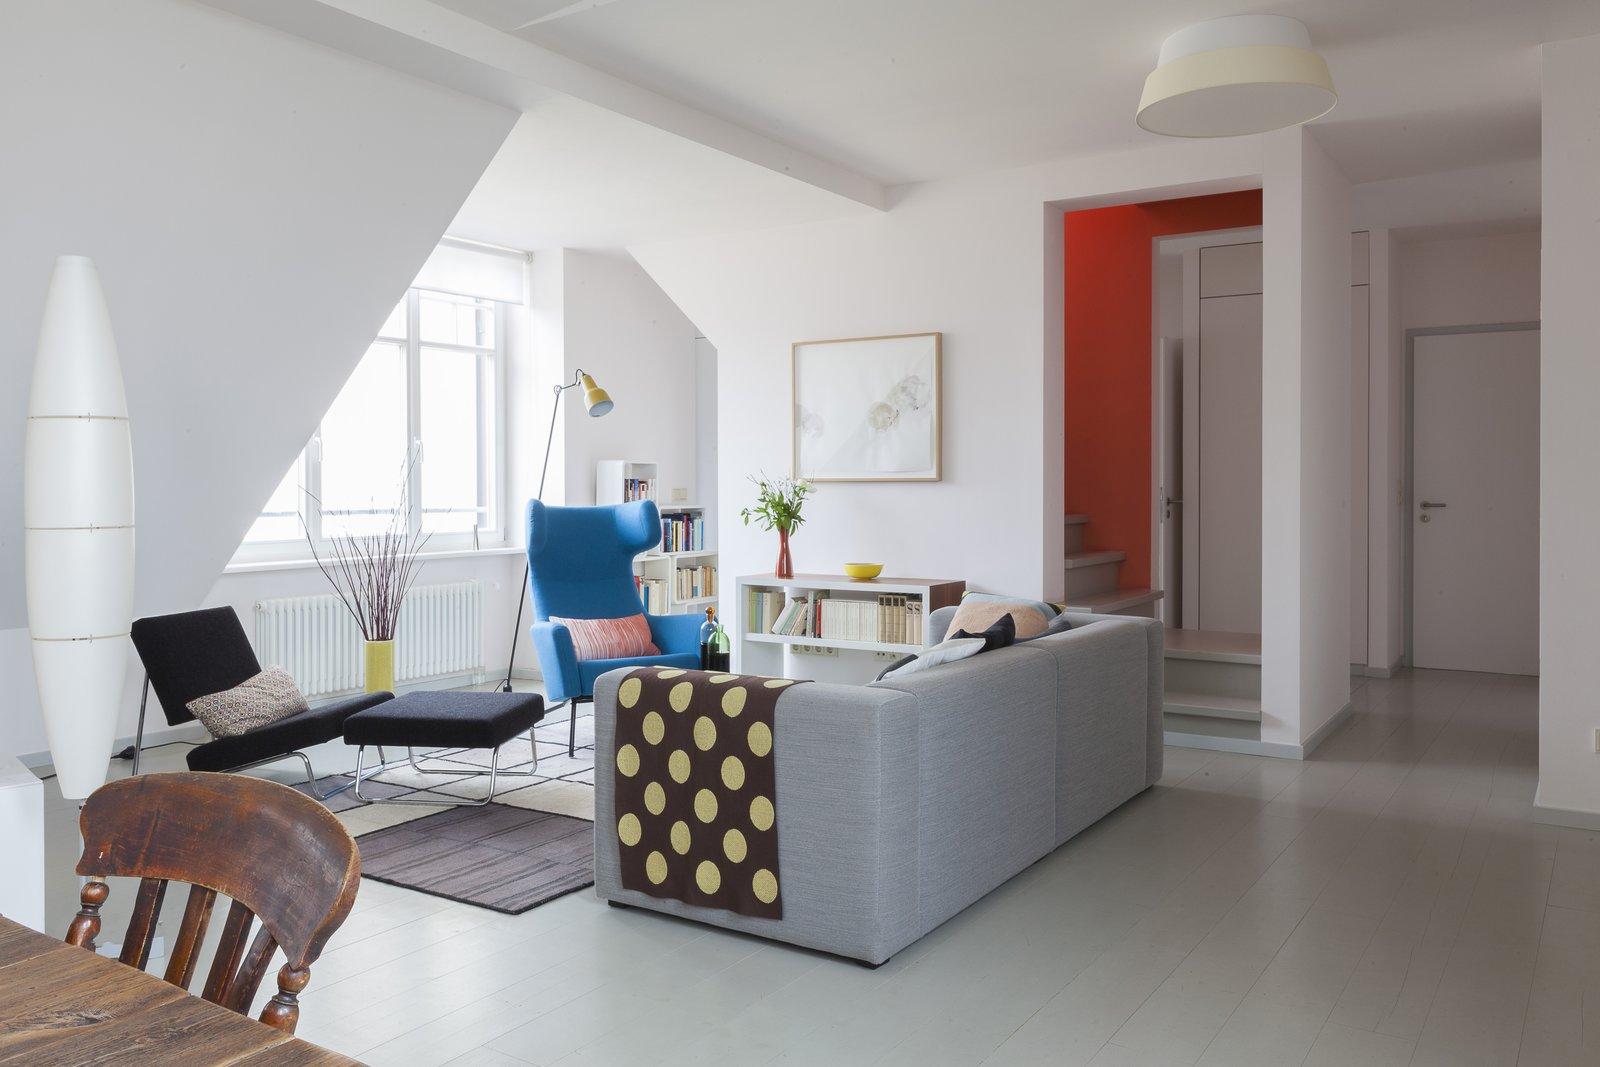 24 Hours Berlin penthouse living area